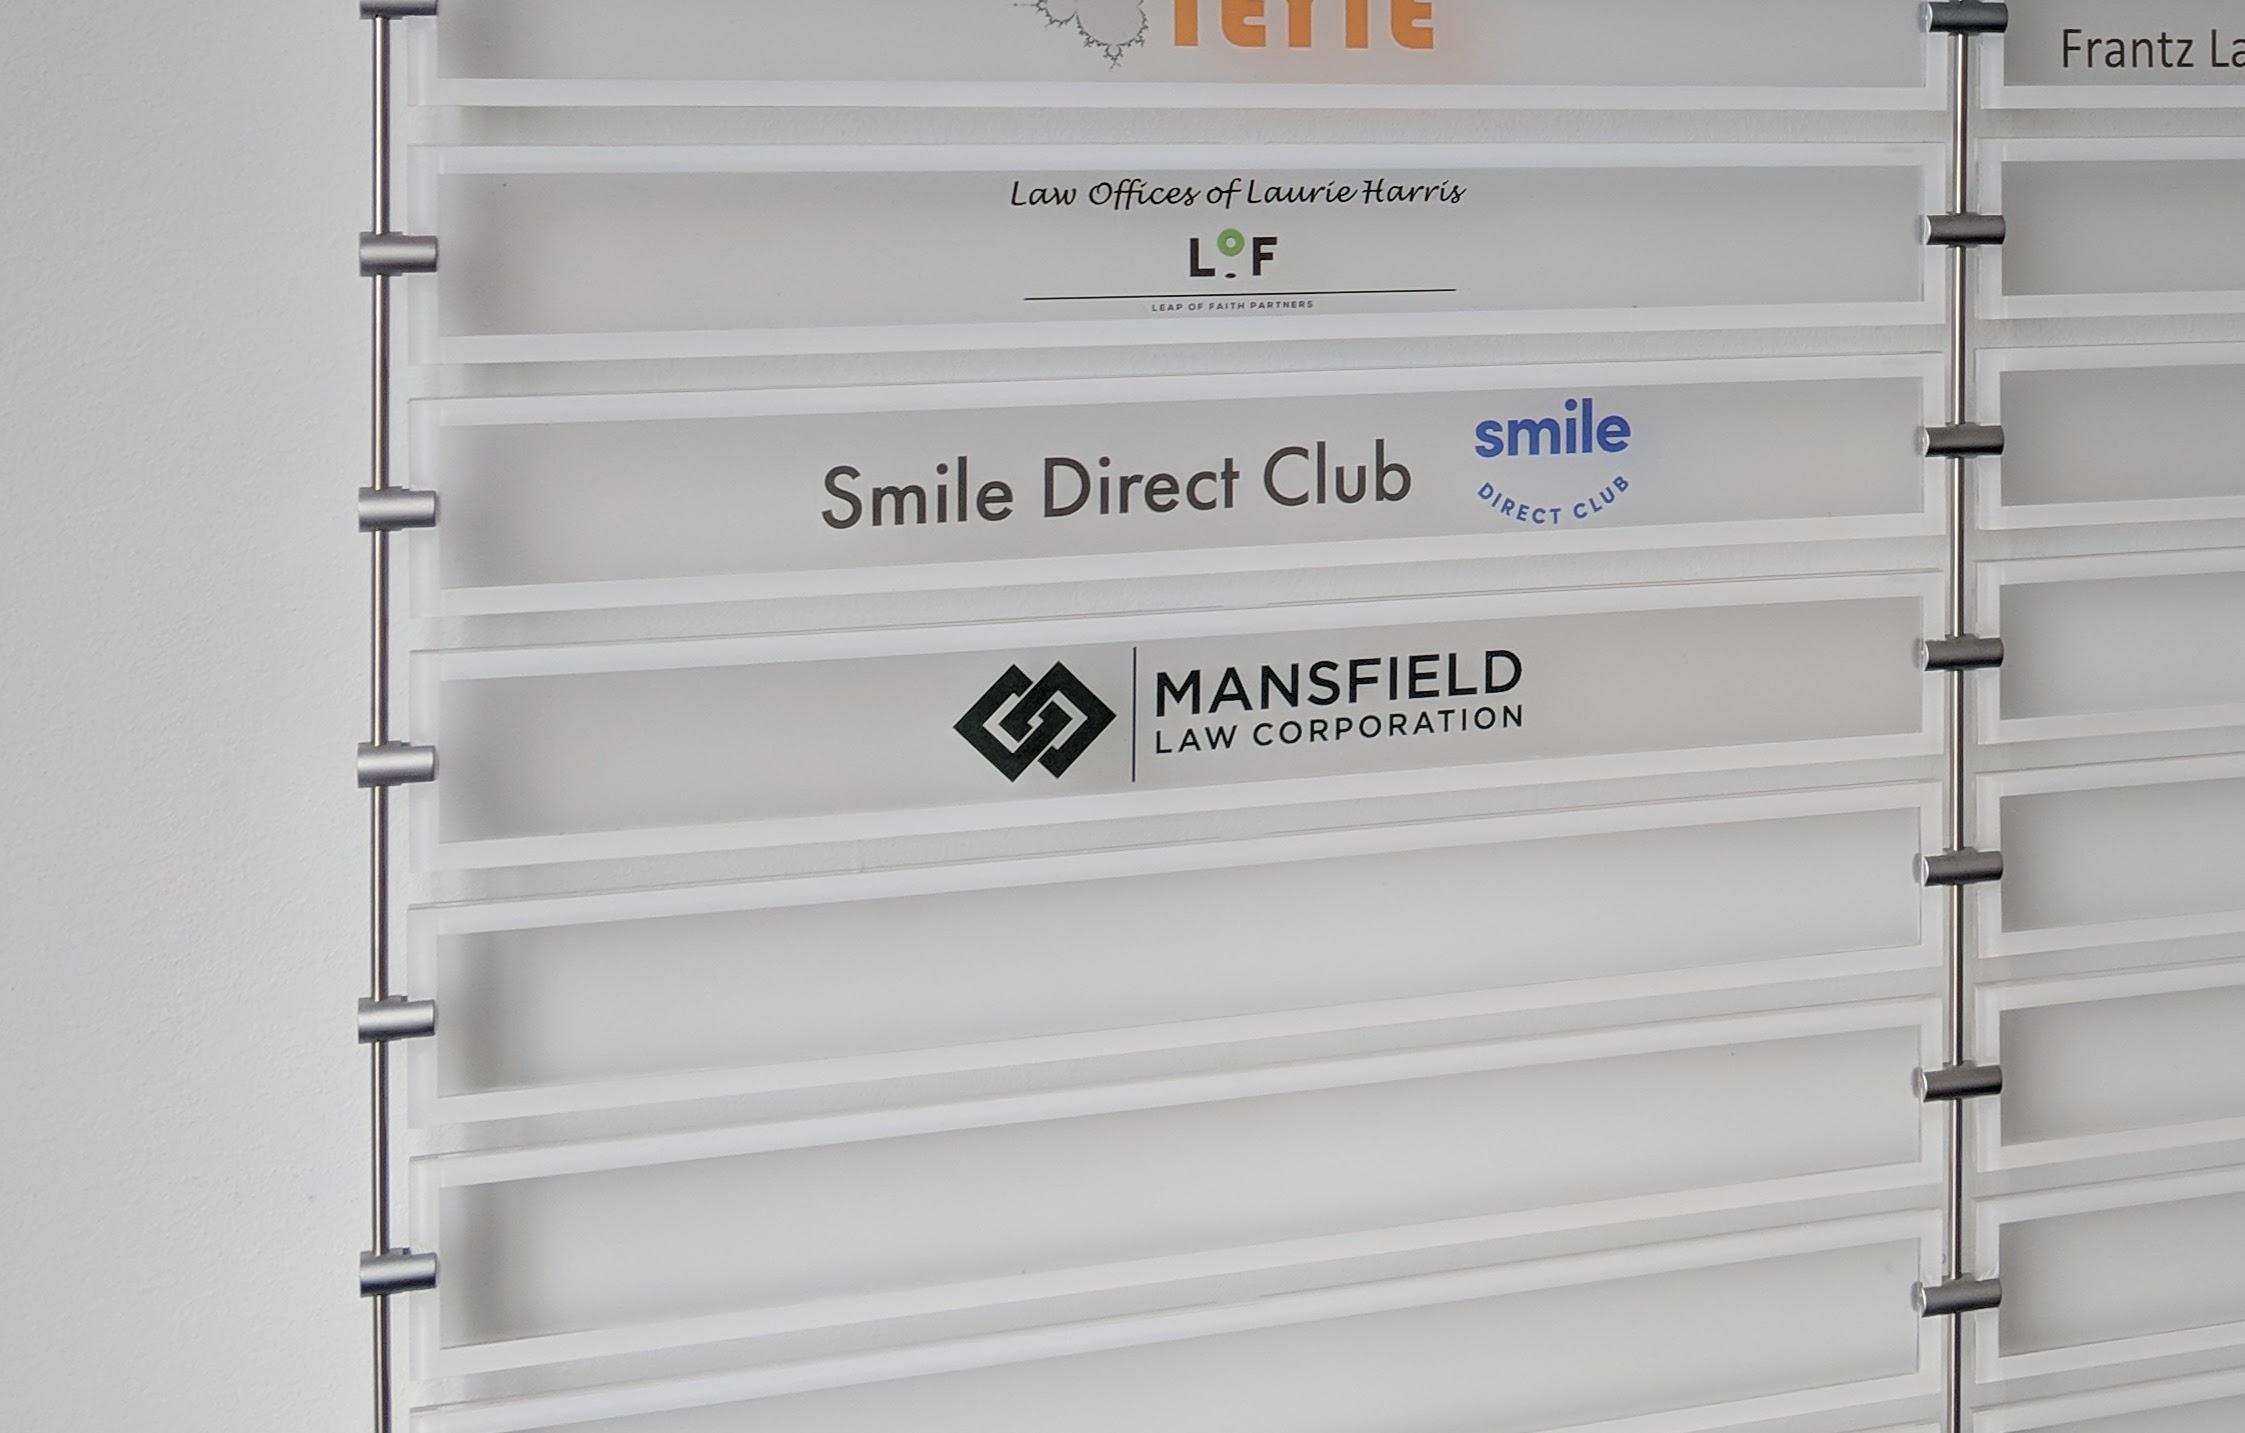 Mansfield Law Corporation image 4